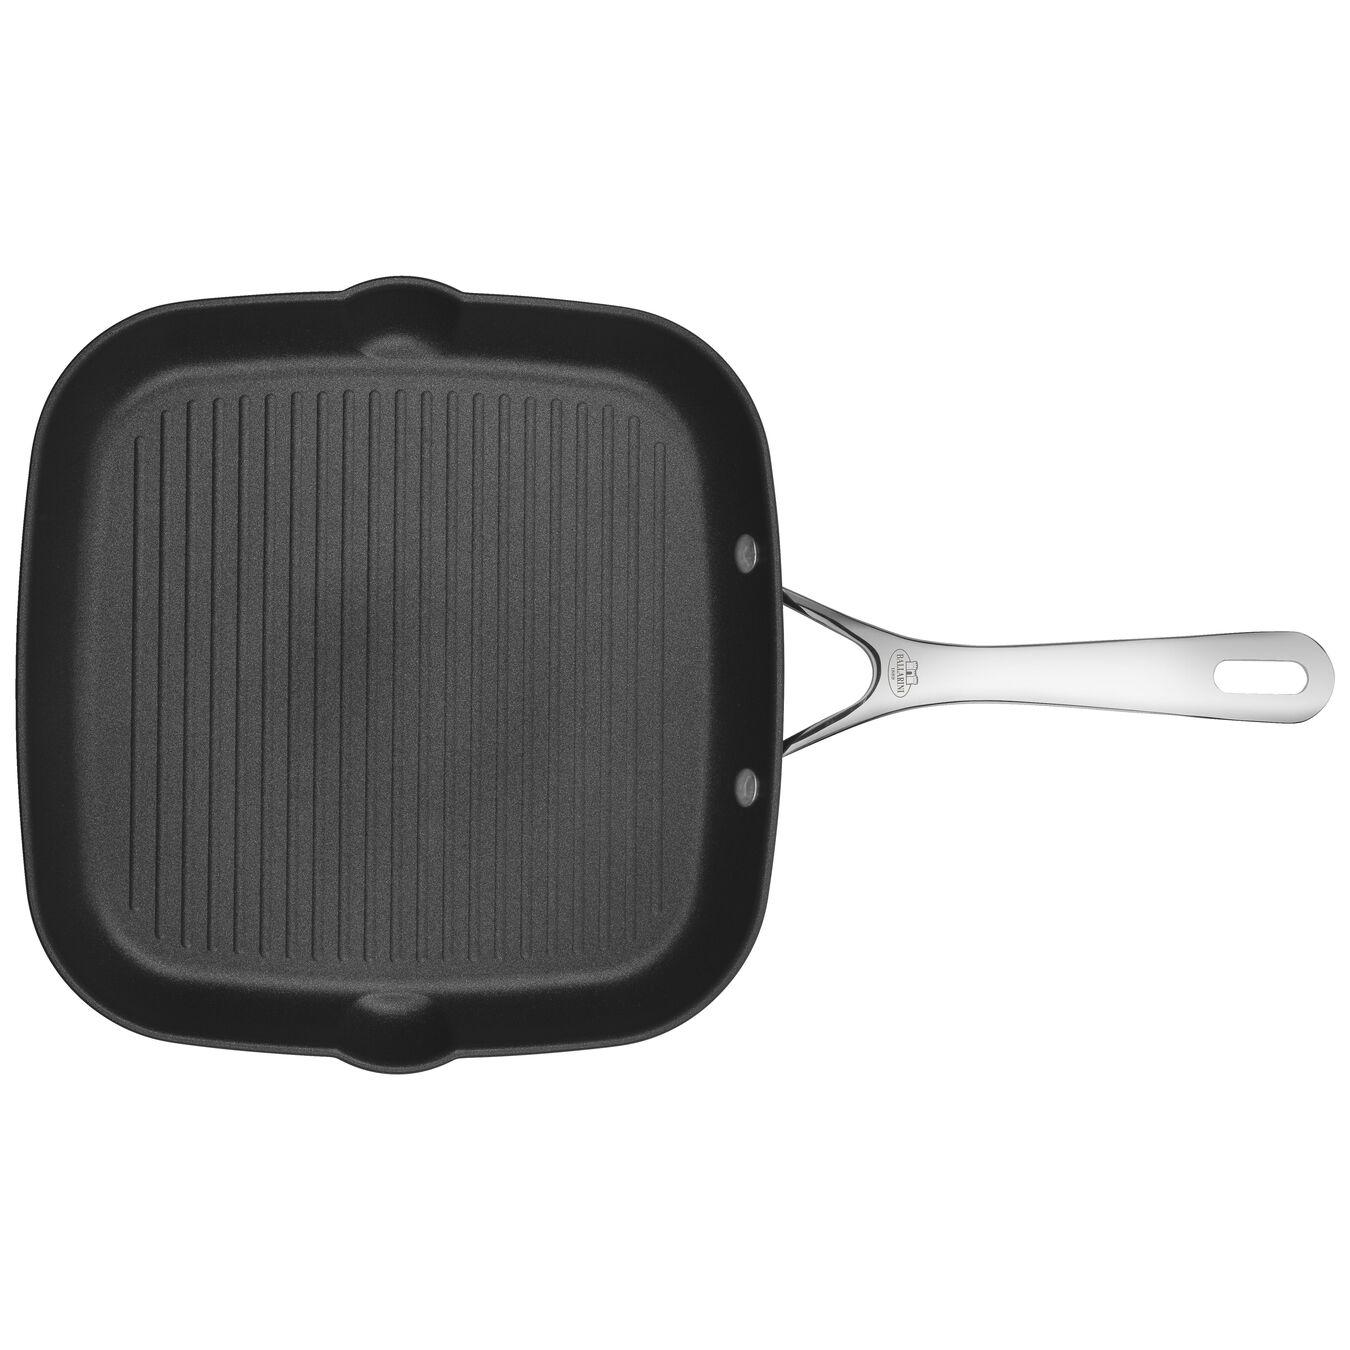 28 cm / 11 inch Aluminum round Grill pan, Black,,large 2